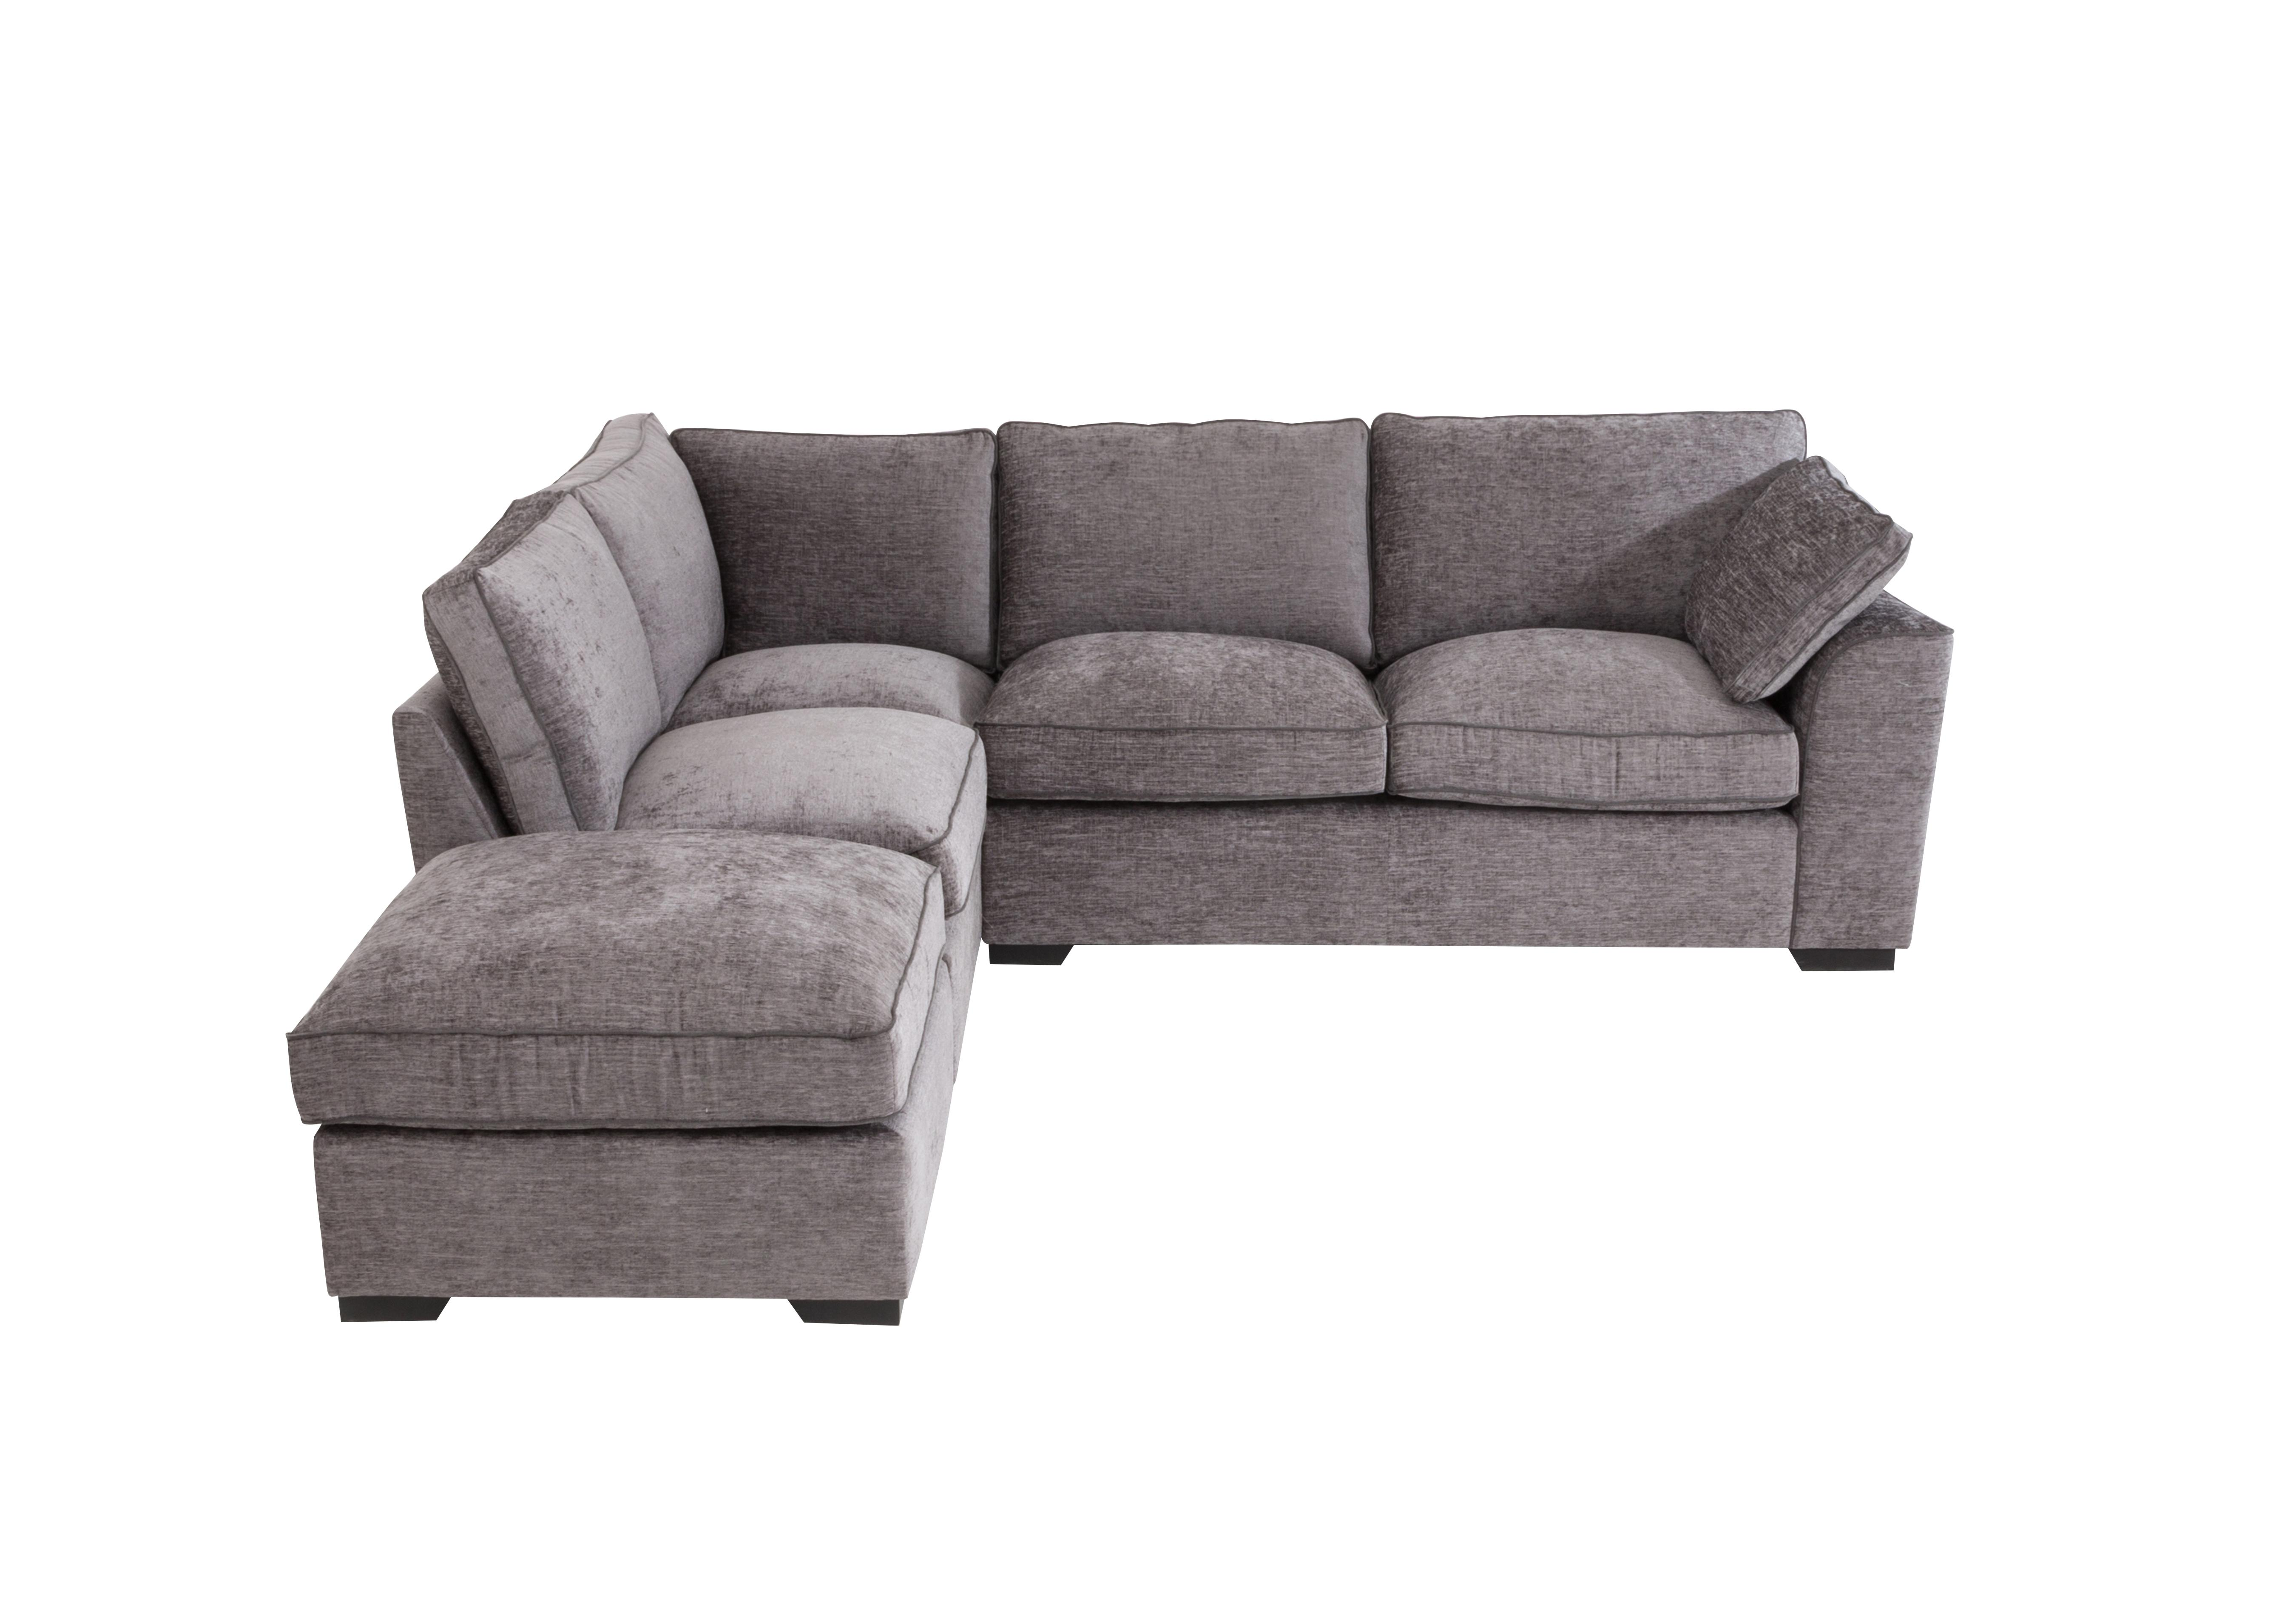 Alexandra Small Corner Sofa with Footstool - Furniture Village